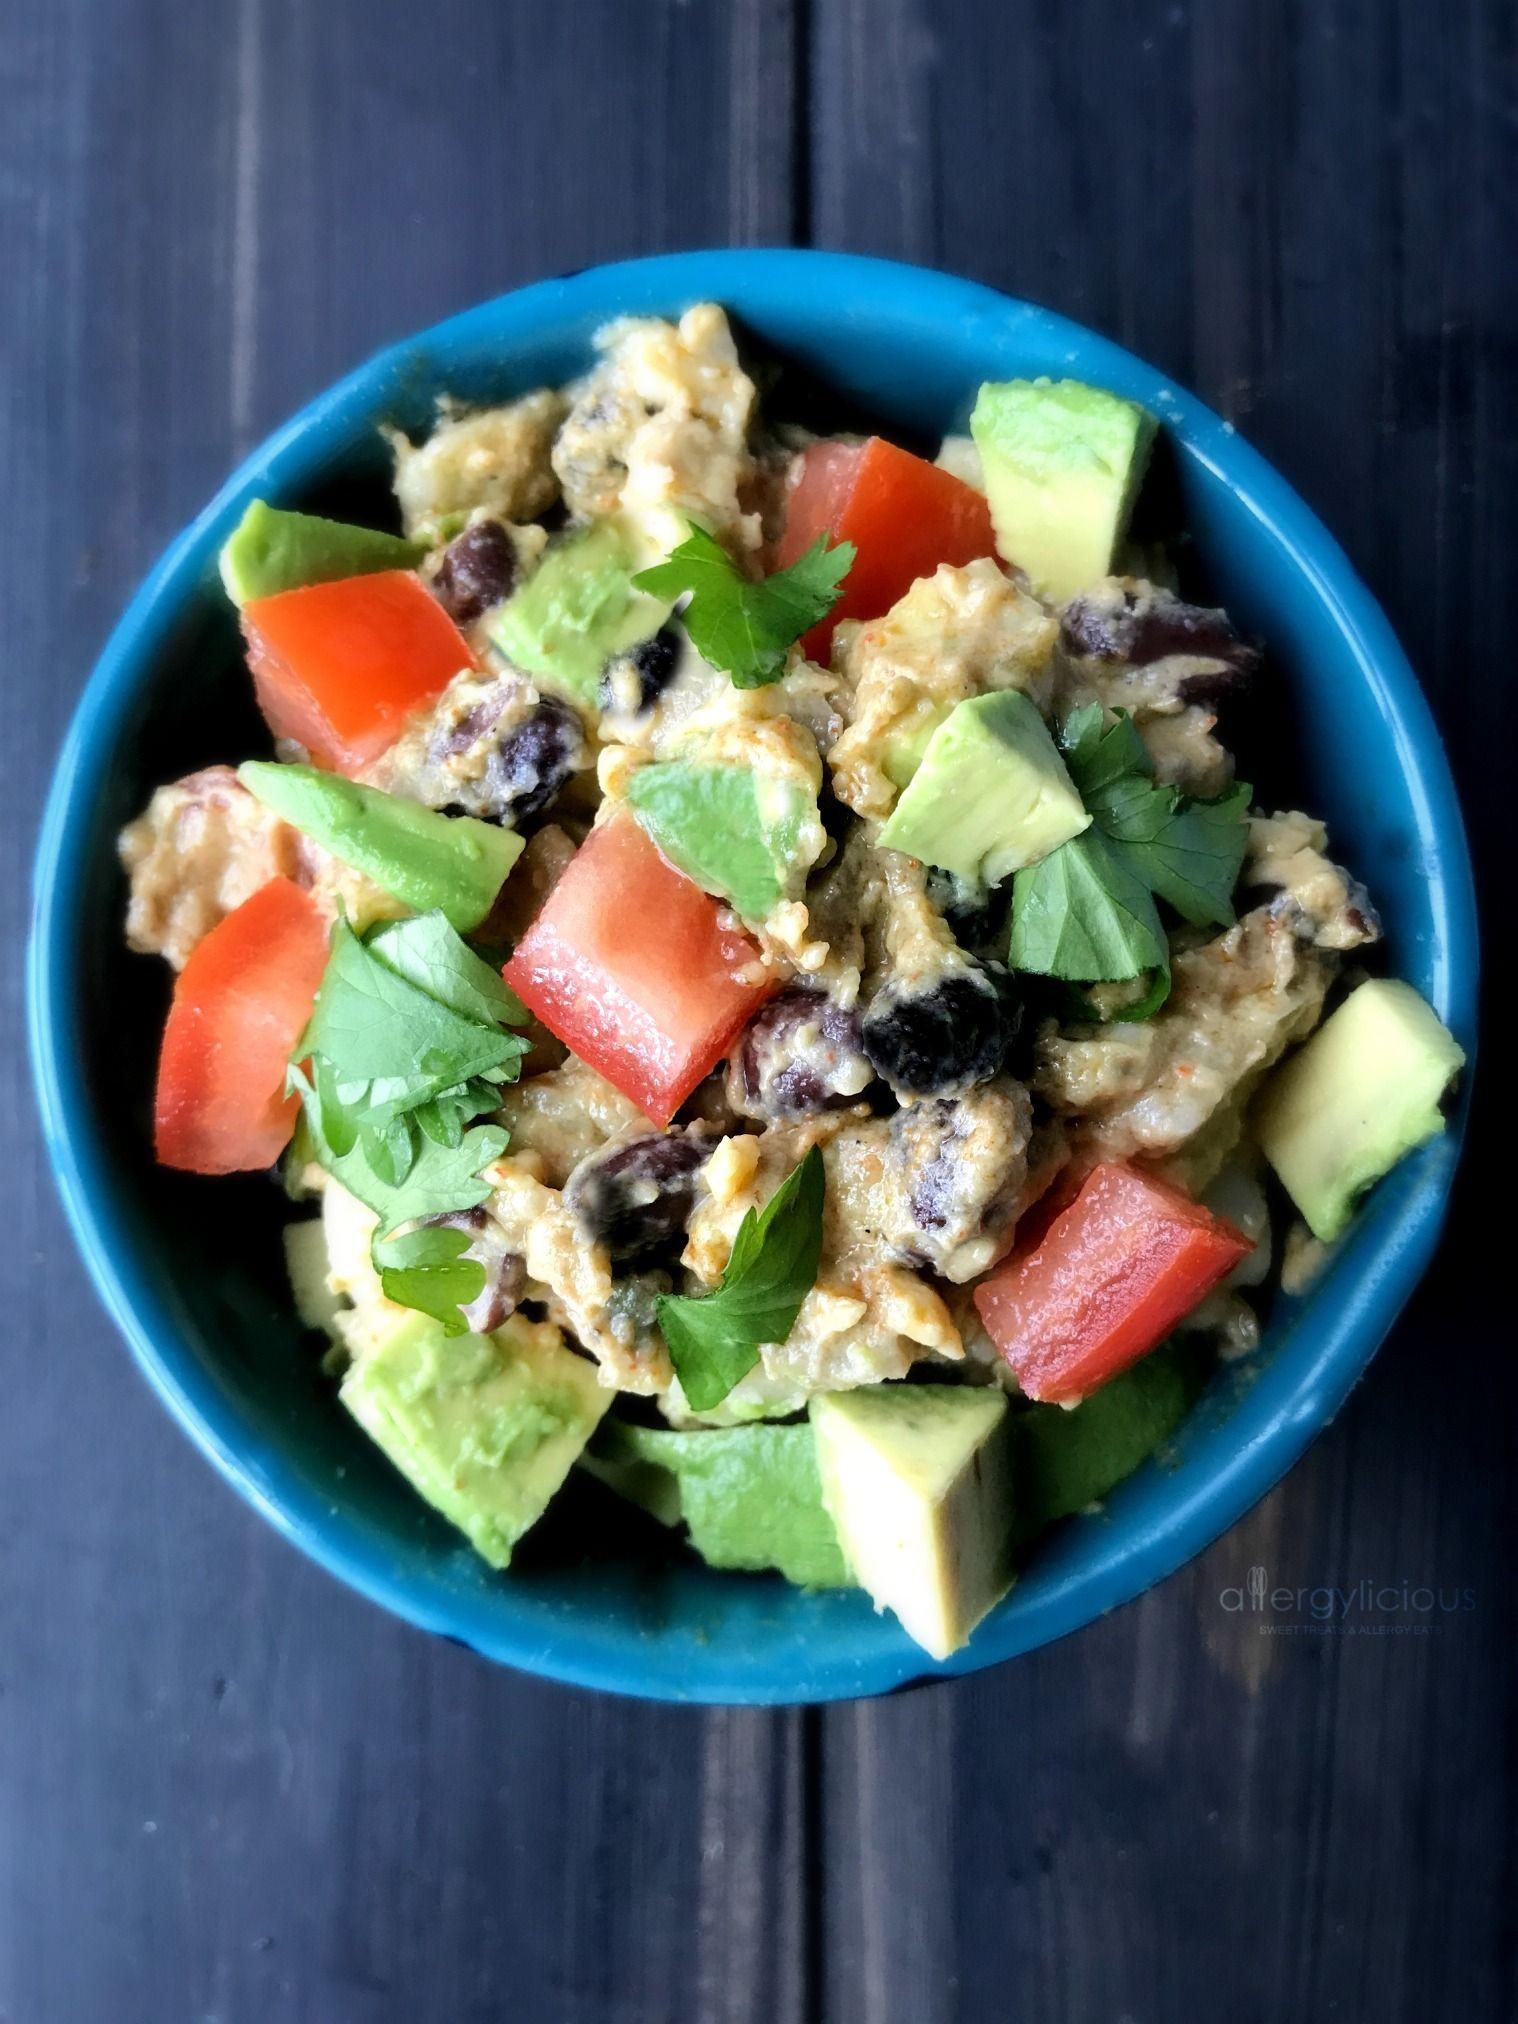 Mexican Potato Salad  Mexican Potato Salad · Allergylicious